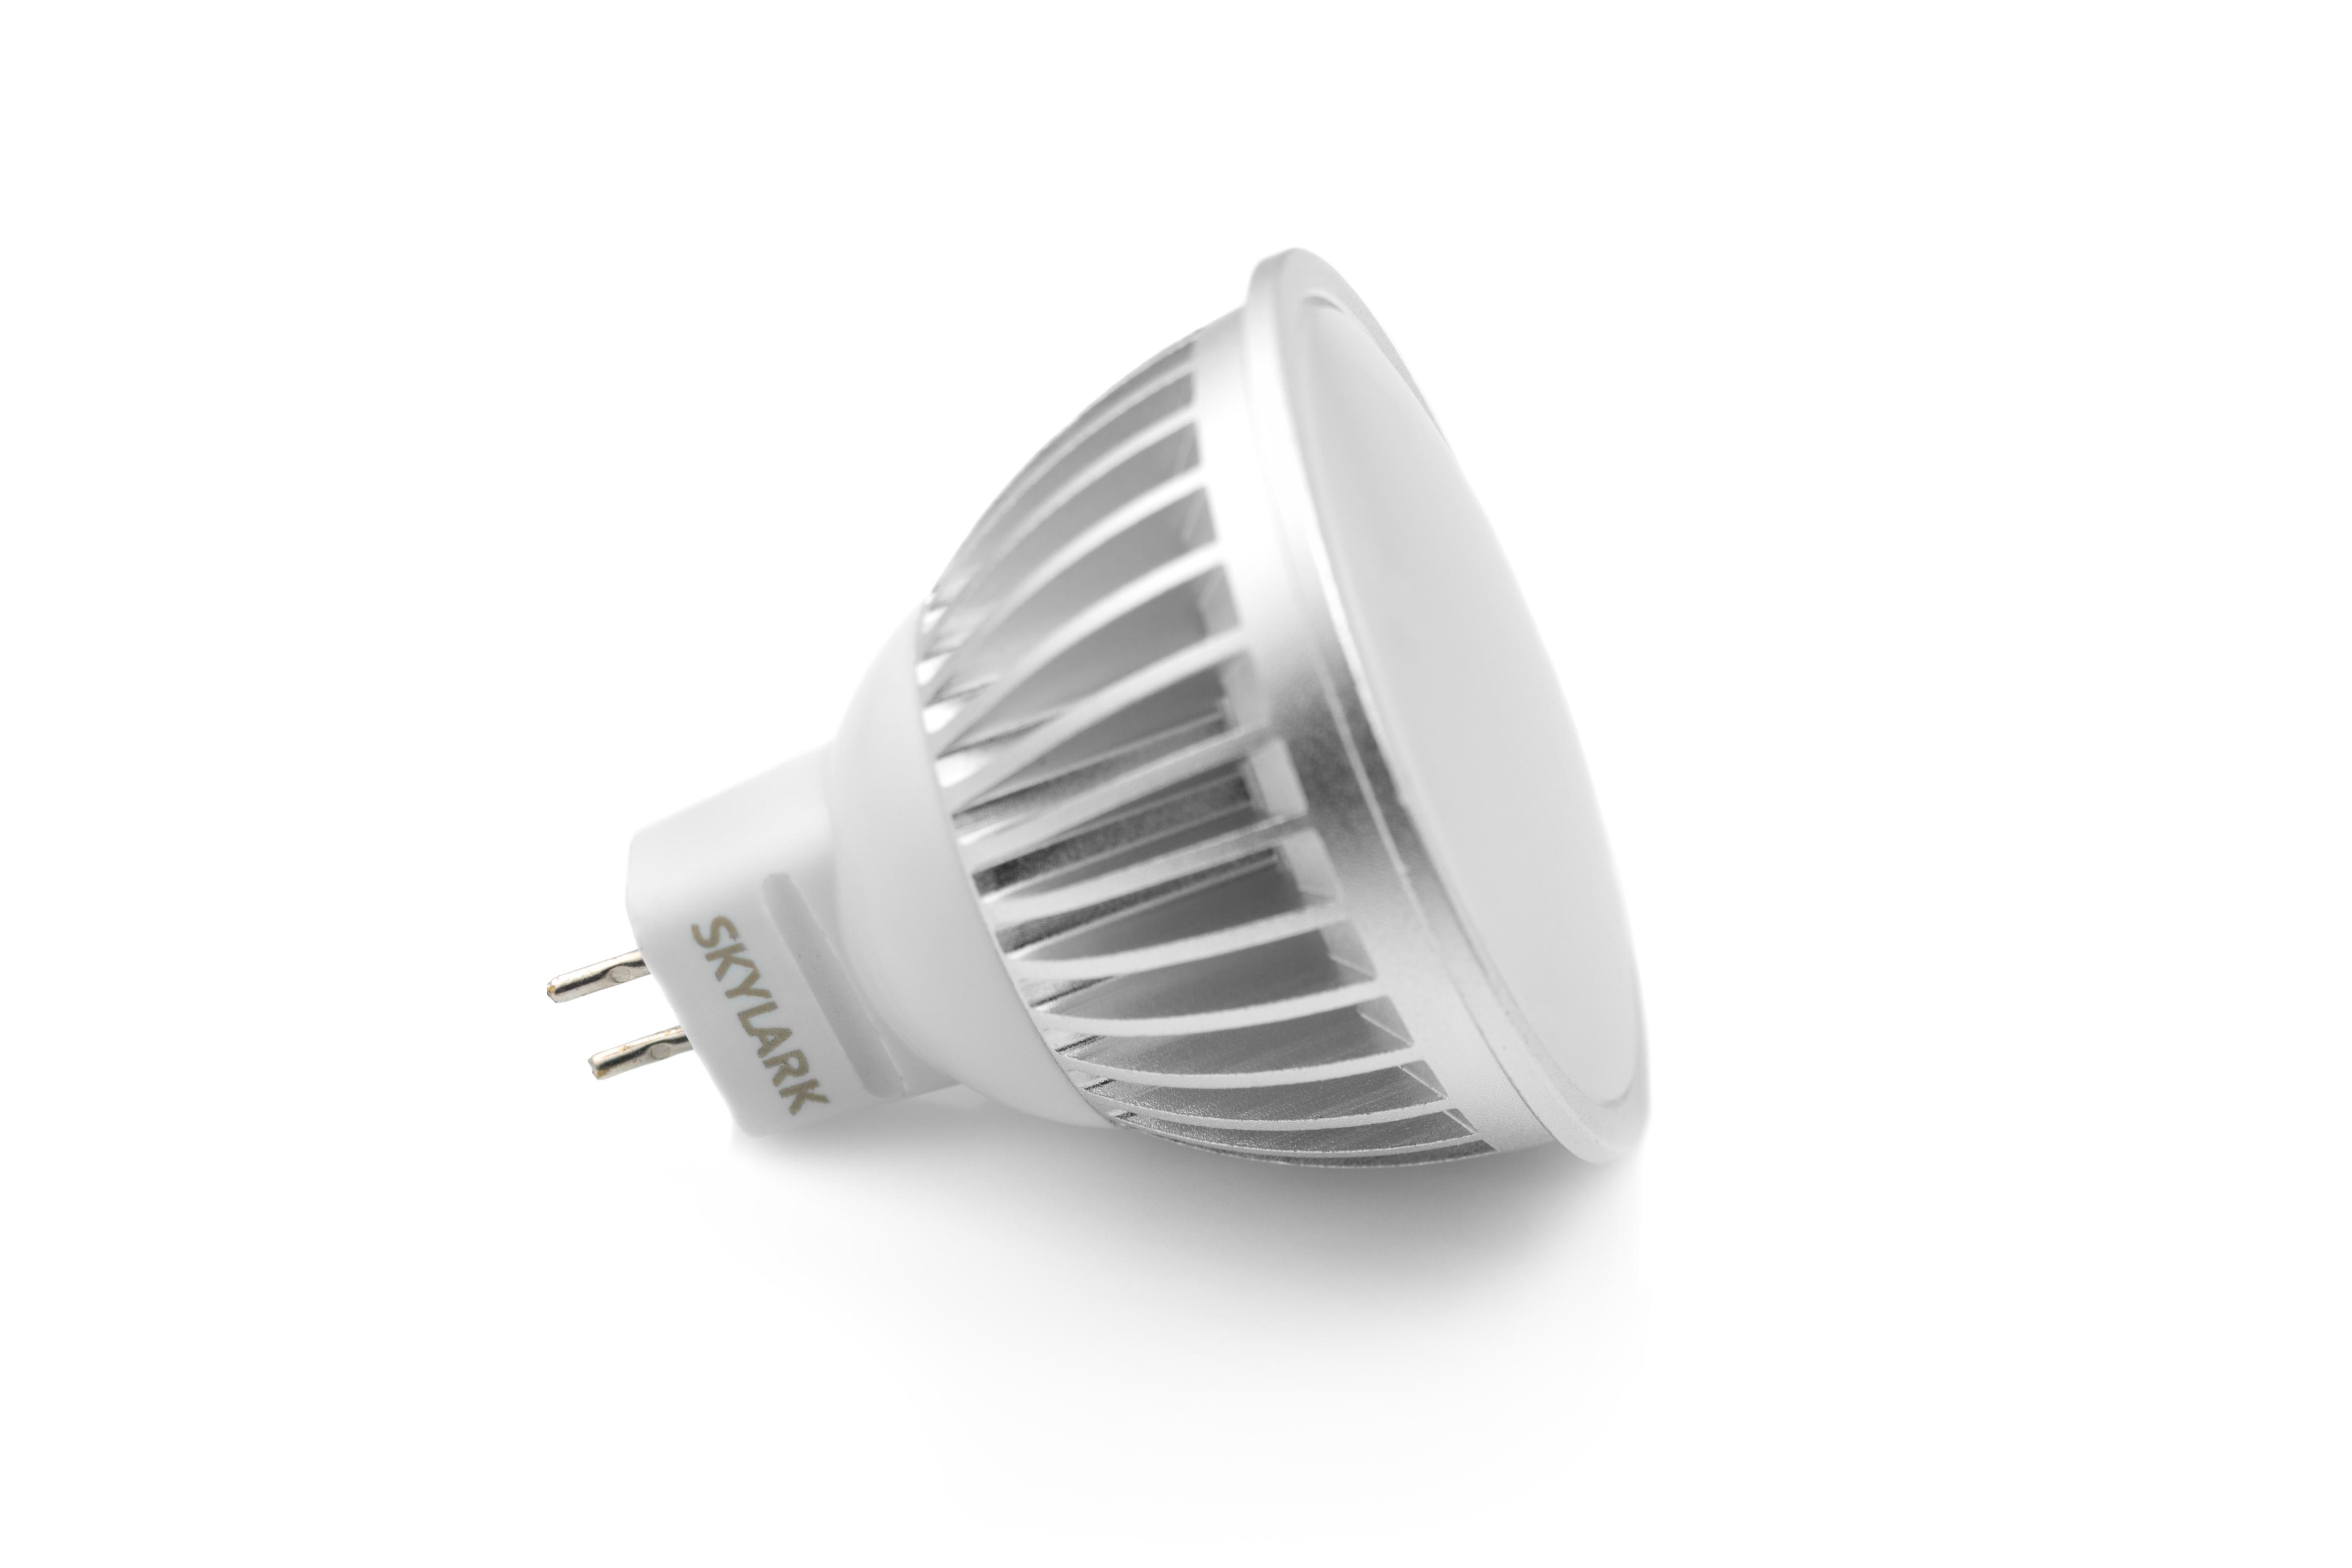 Лампа светодиодная Skylark D011 skylark светодиодная лампа skylark e14 4 5w 2700k свеча матовая b007